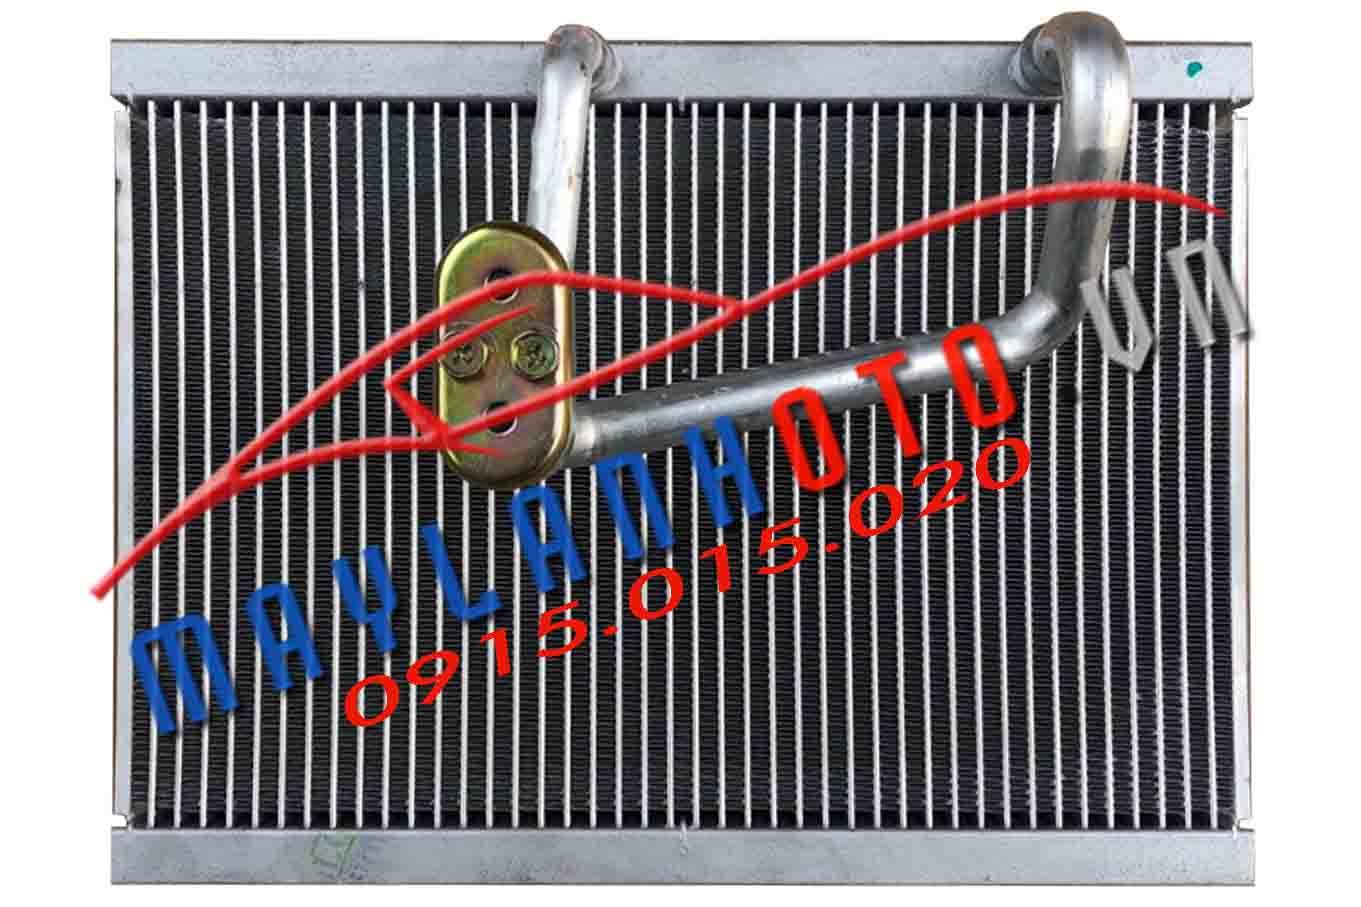 Hyundai Trago Xcient 15-24T / Dàn lạnh Hyundai Trago Xcient 15-24 tấn / Giàn lạnh Hyundai Trago Xcient 15-24 tấn